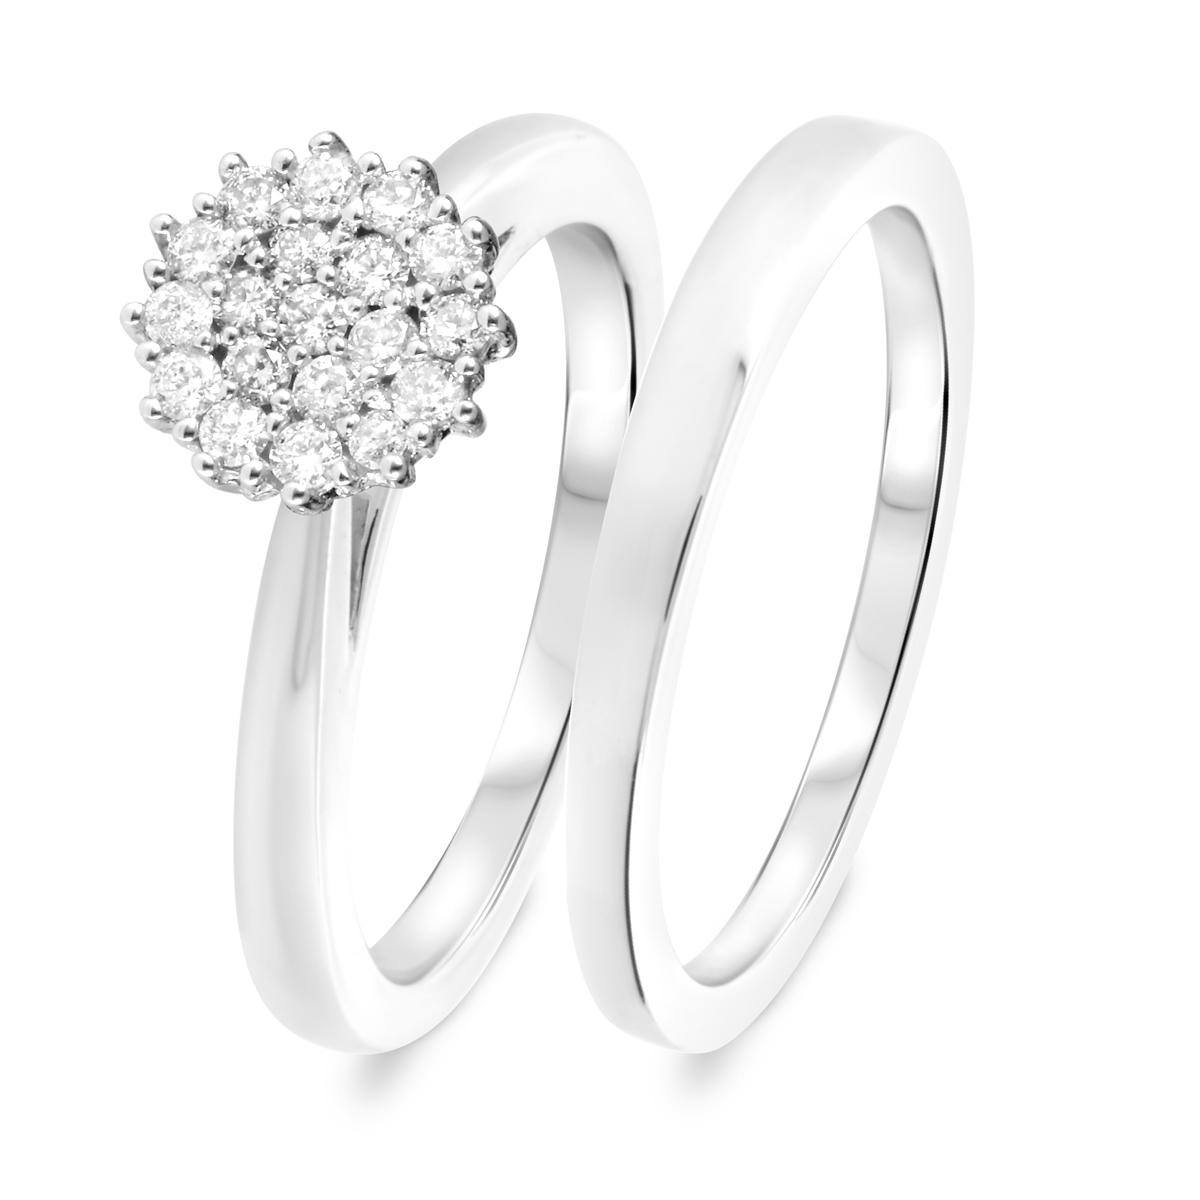 1/2 CT. T.W. Diamond Women's Bridal Wedding Ring Set 10K White Gold